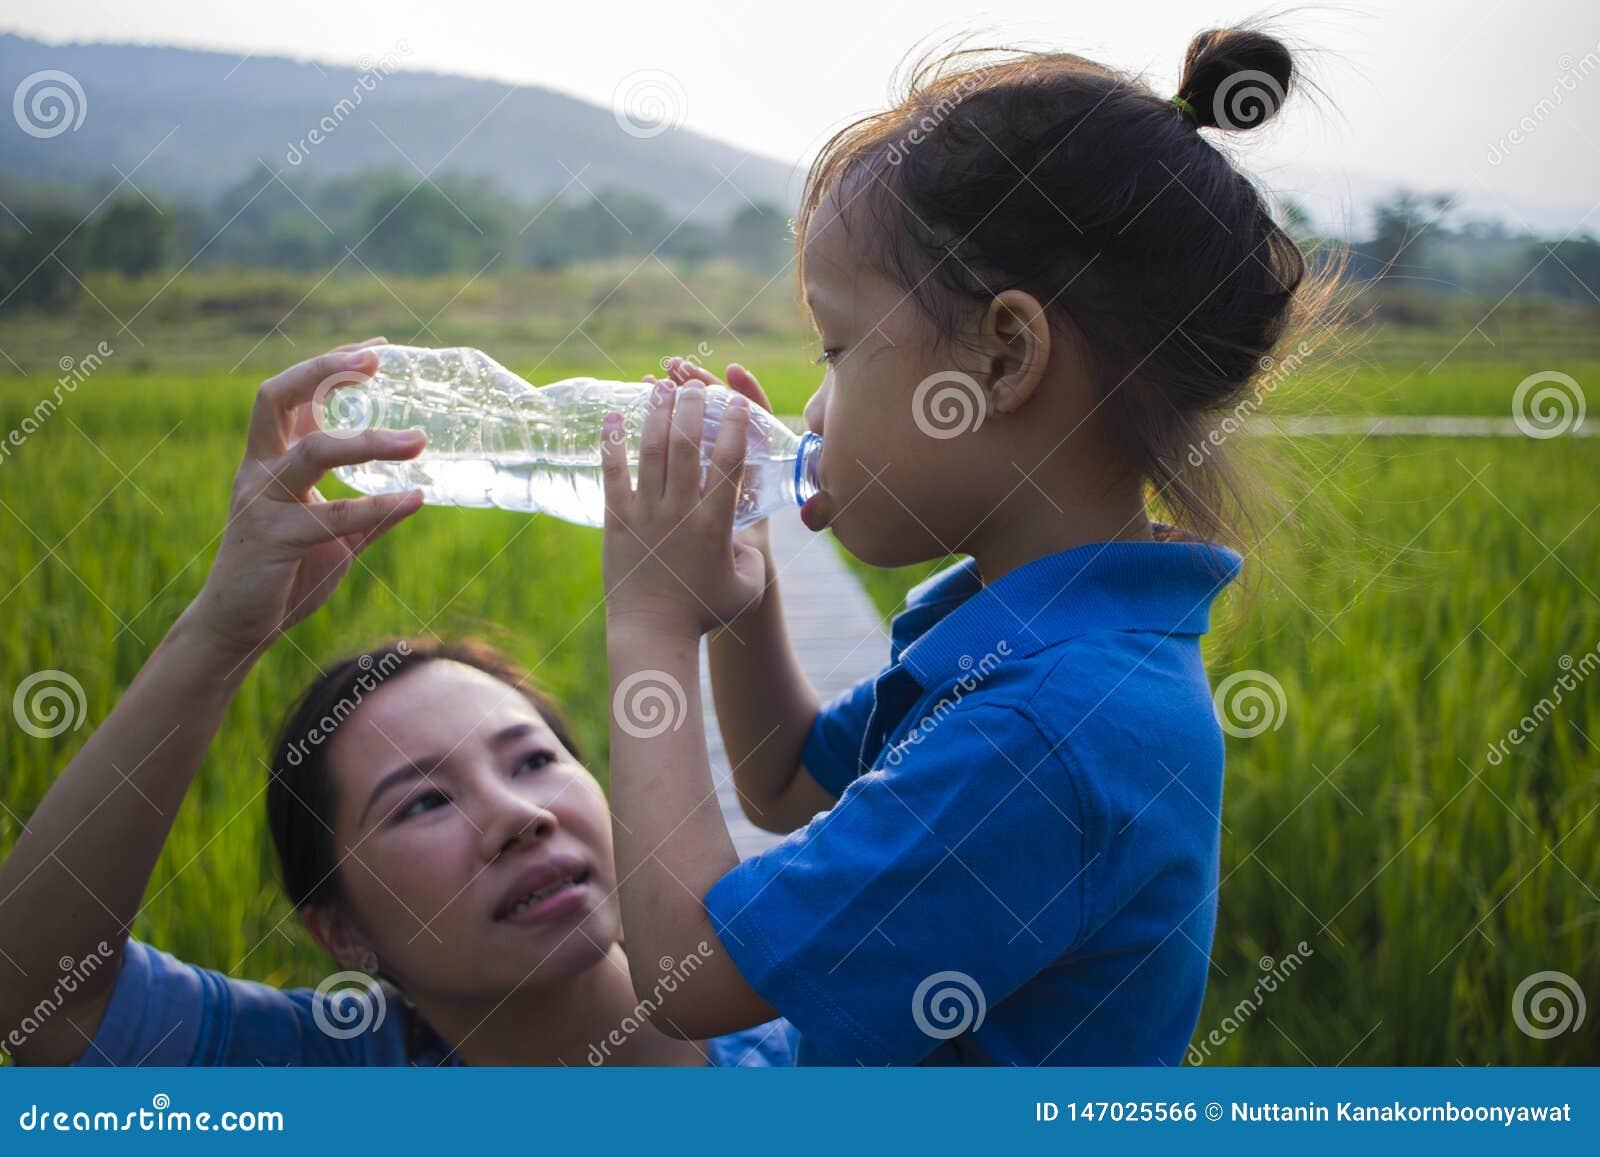 Mother help her children drinking water from bottle in rice field. long hair boy